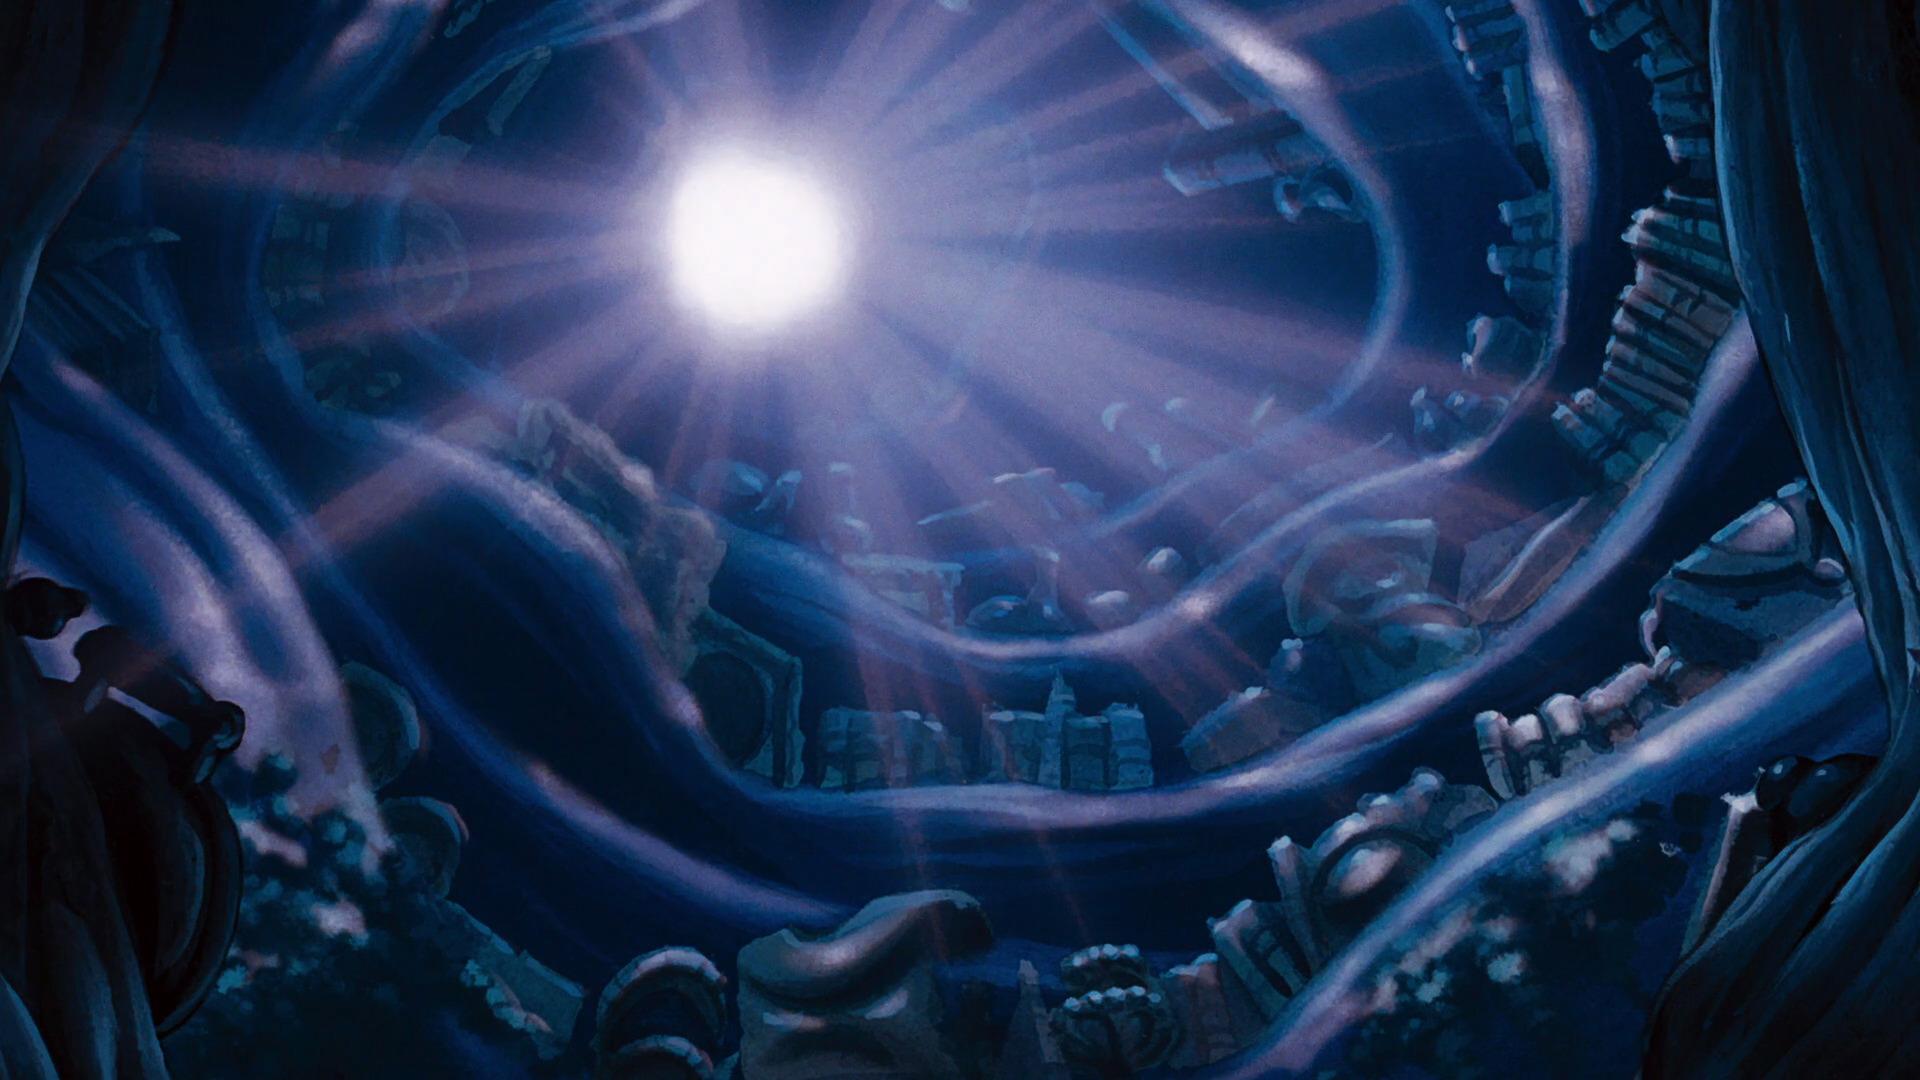 Image Little Mermaid 1080p Disneyscreencaps Com 1906 Jpg